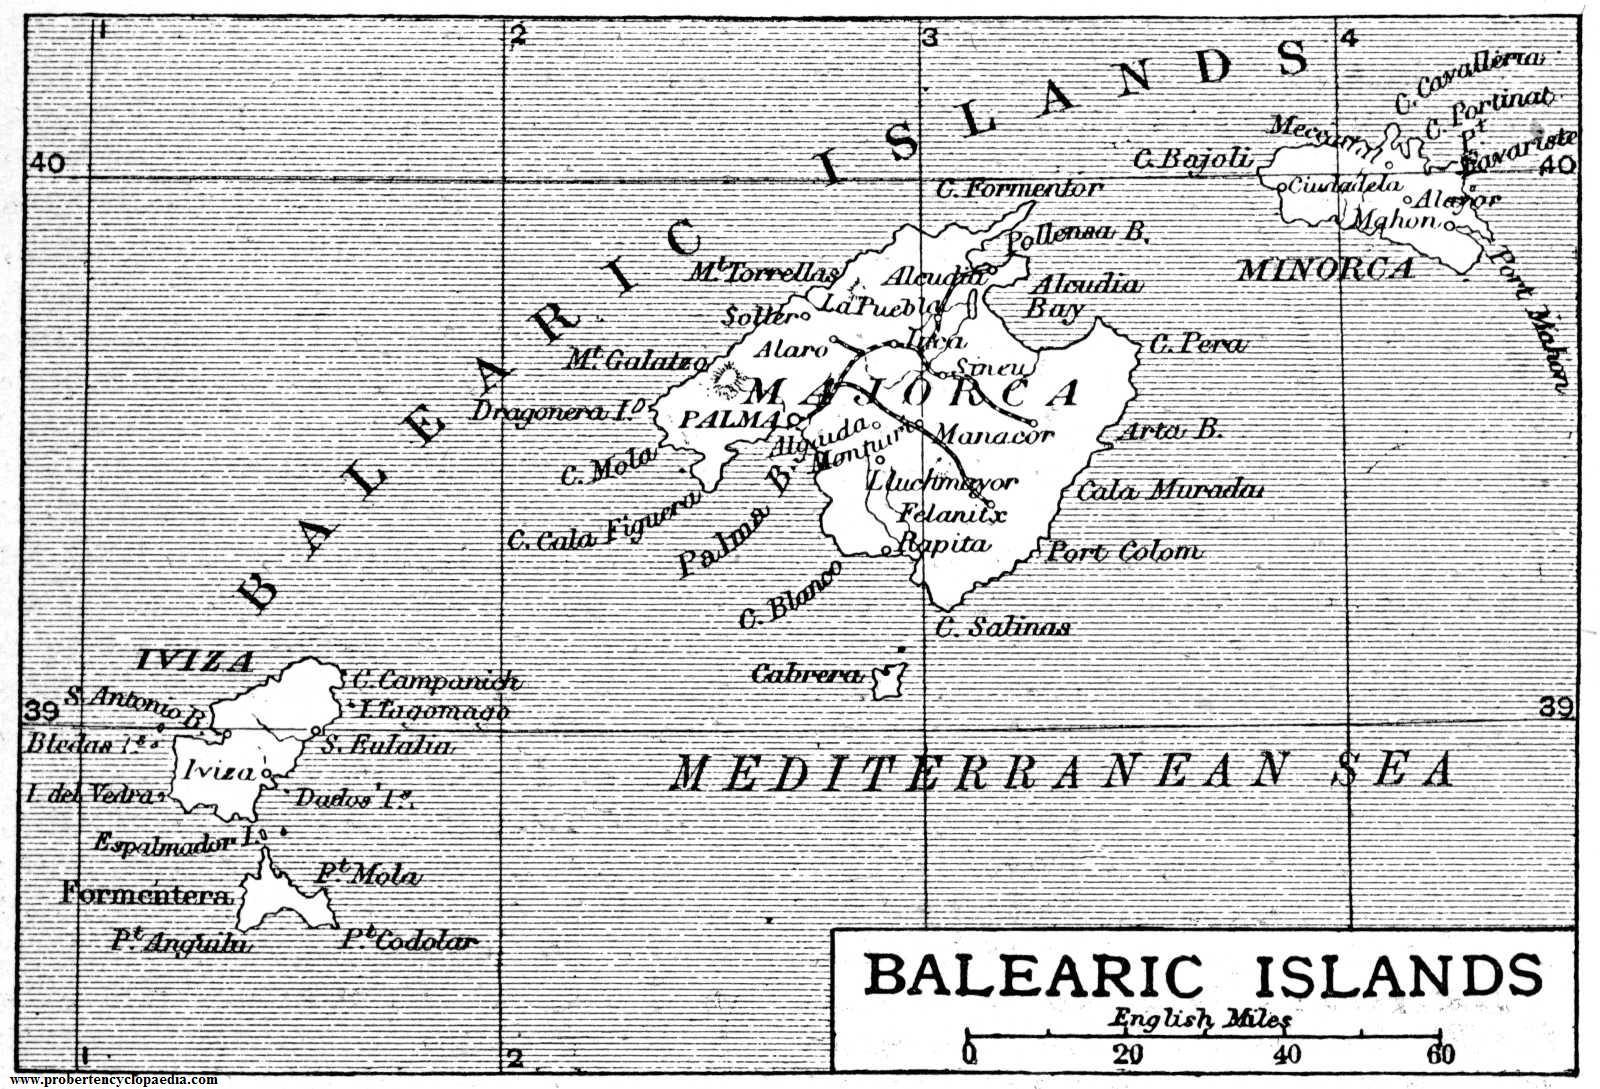 Las Islas Baleares 1906